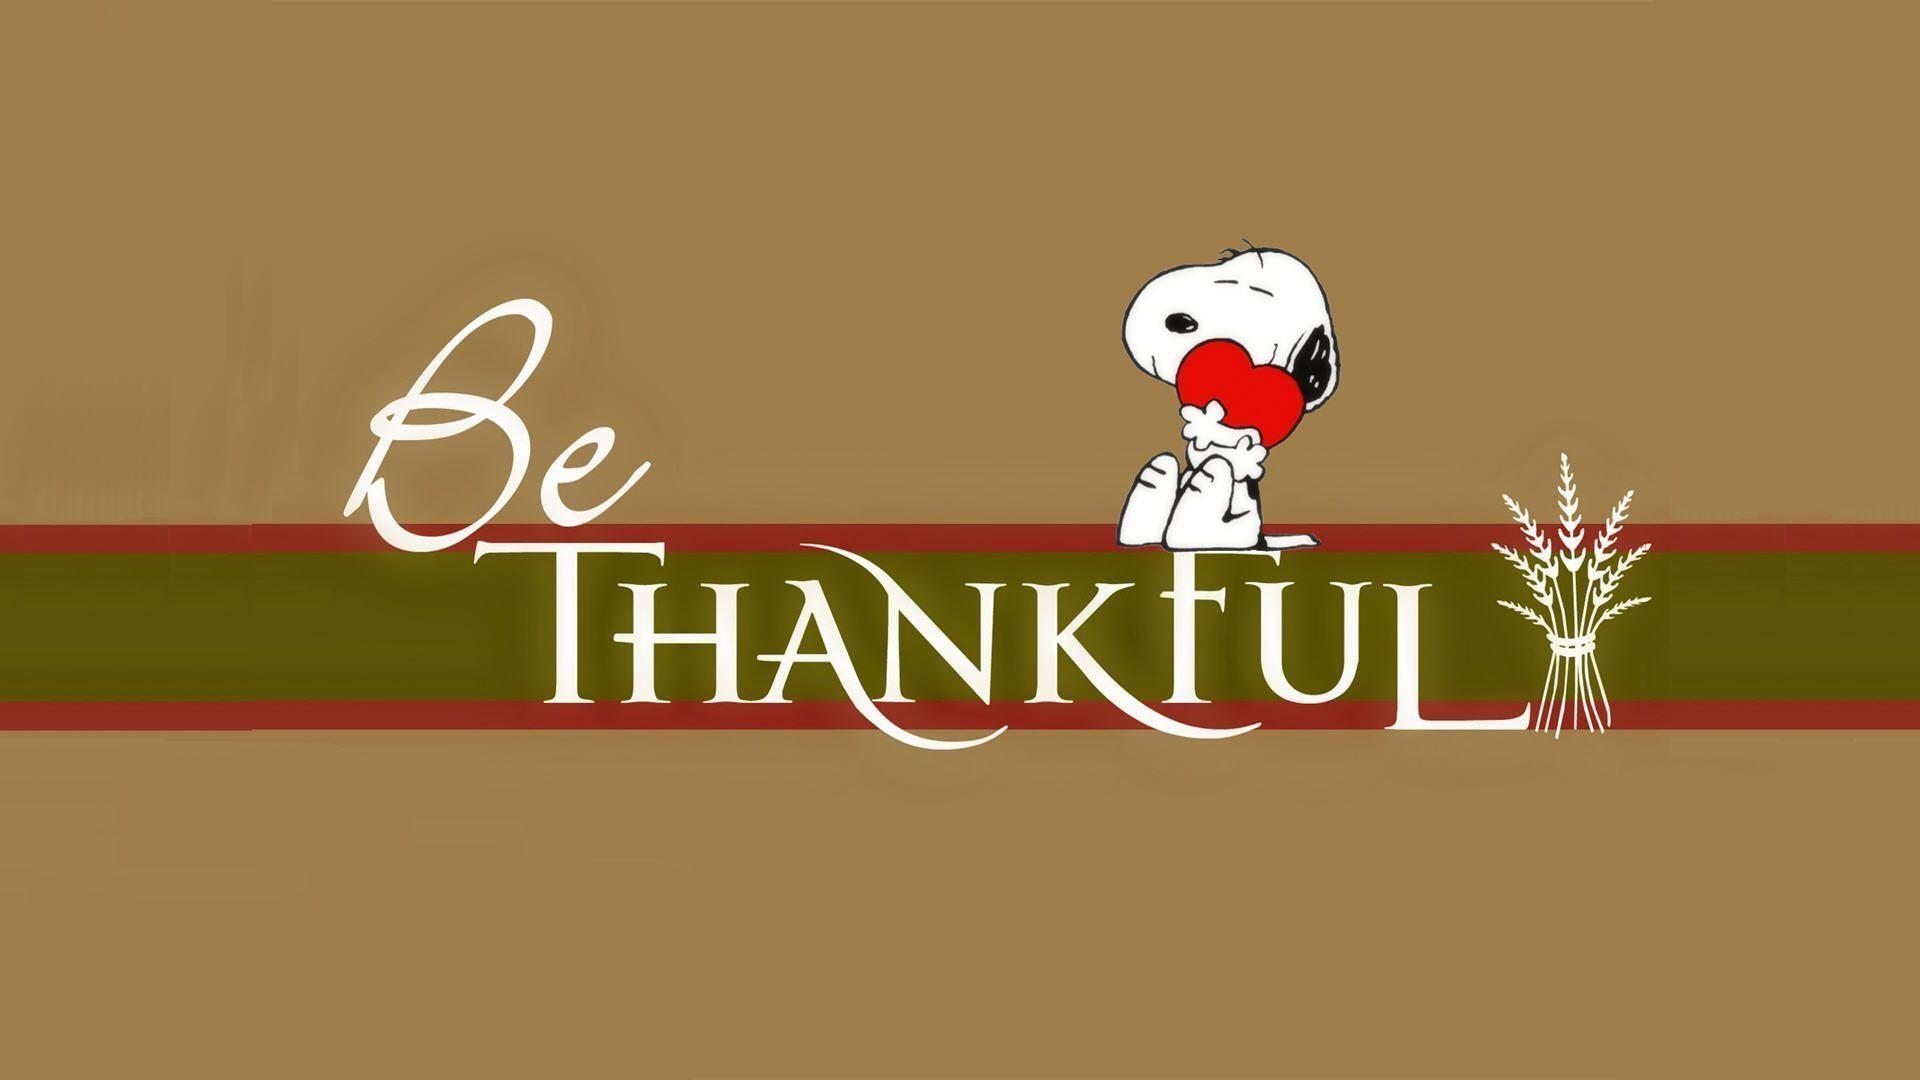 Res: 1920x1080, Snoopy Thanksgiving High Resolution HD Wallpaper - Beraplan.